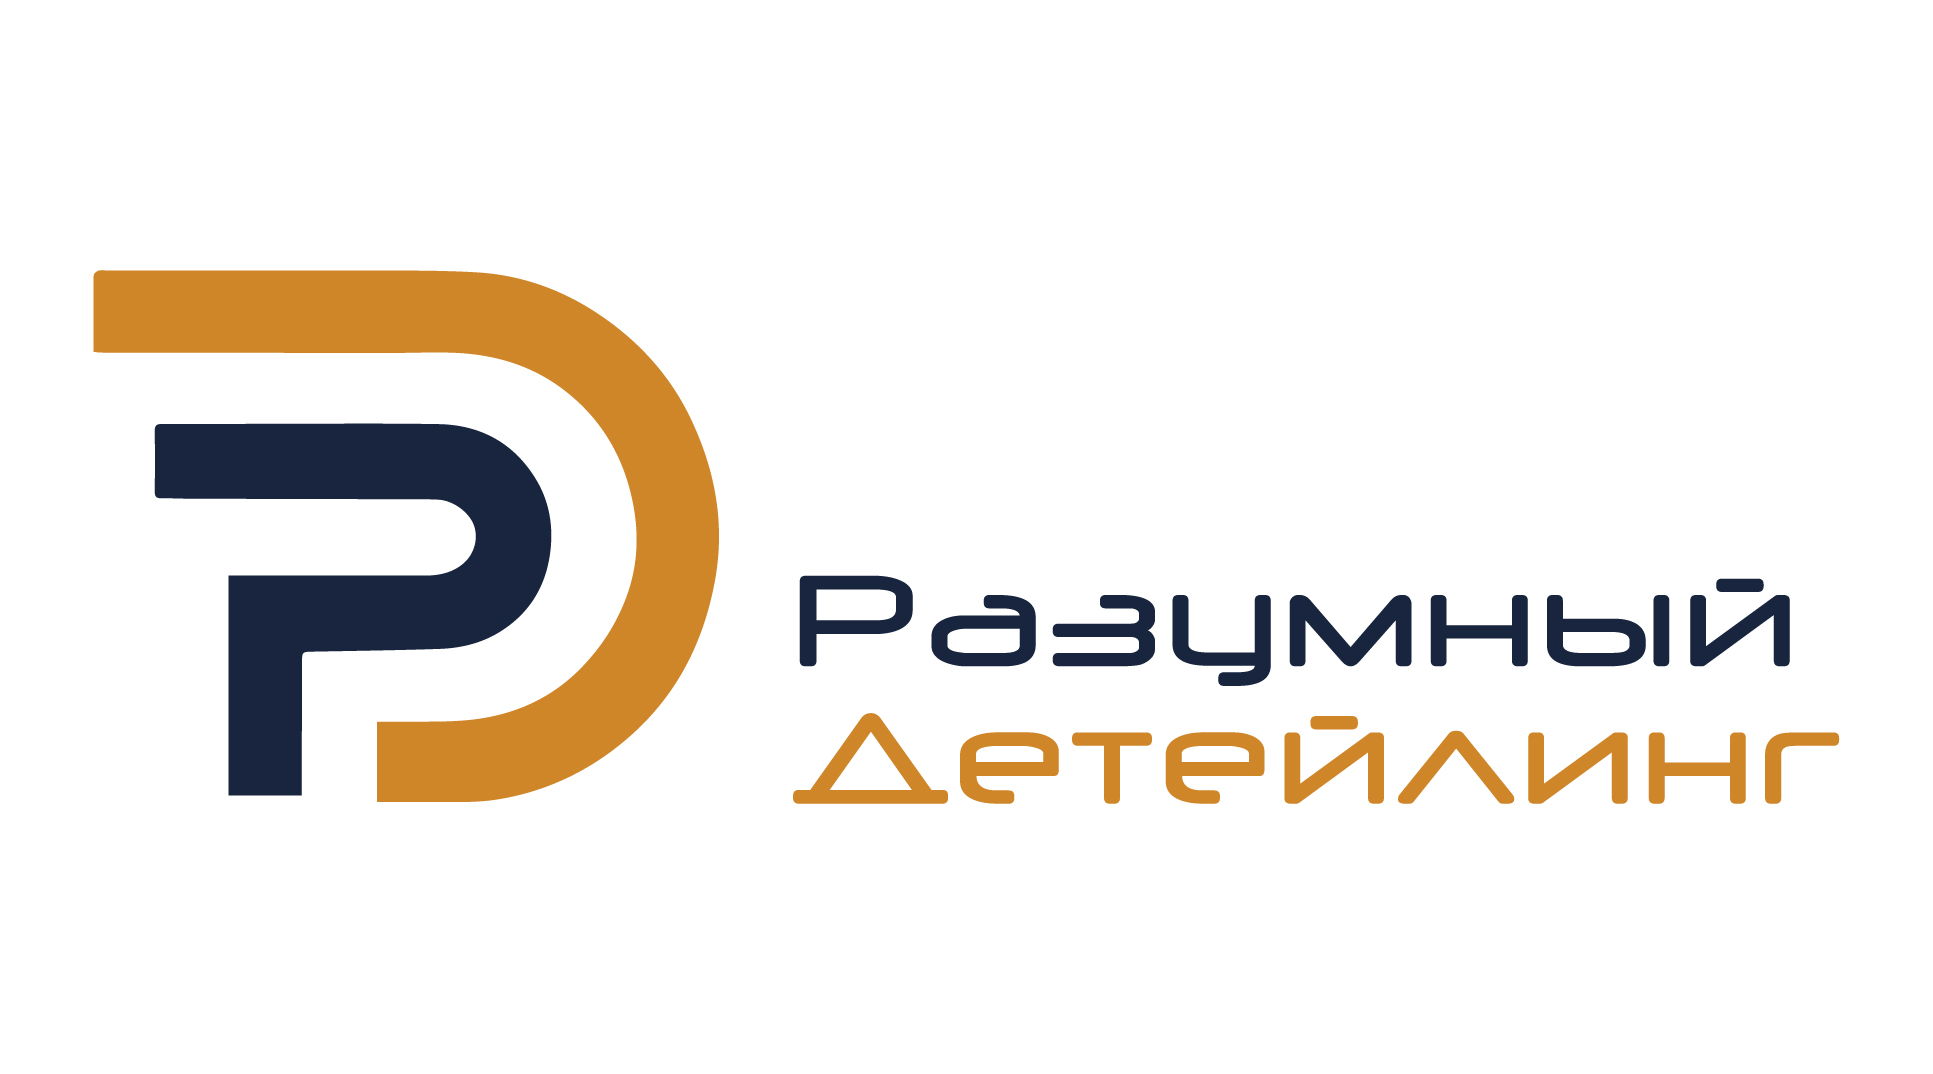 Ребрендинг логотипа  фото f_3415ad82d8ca1cea.jpg